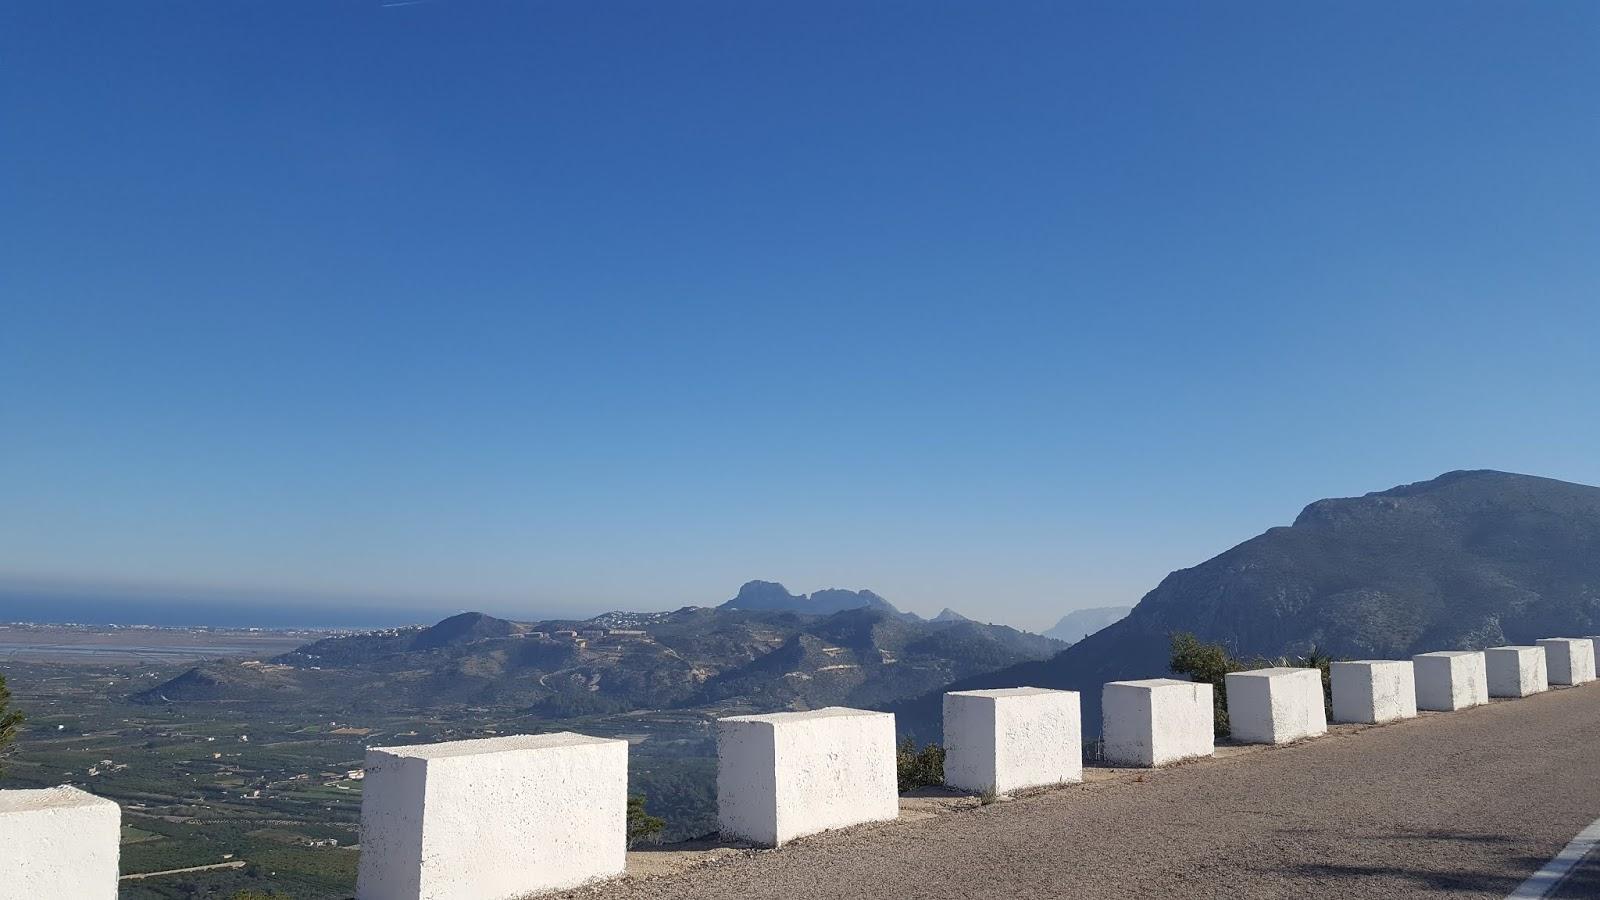 View over Pego-Oliva Marshes, Vall de Ebo climb, Alicante